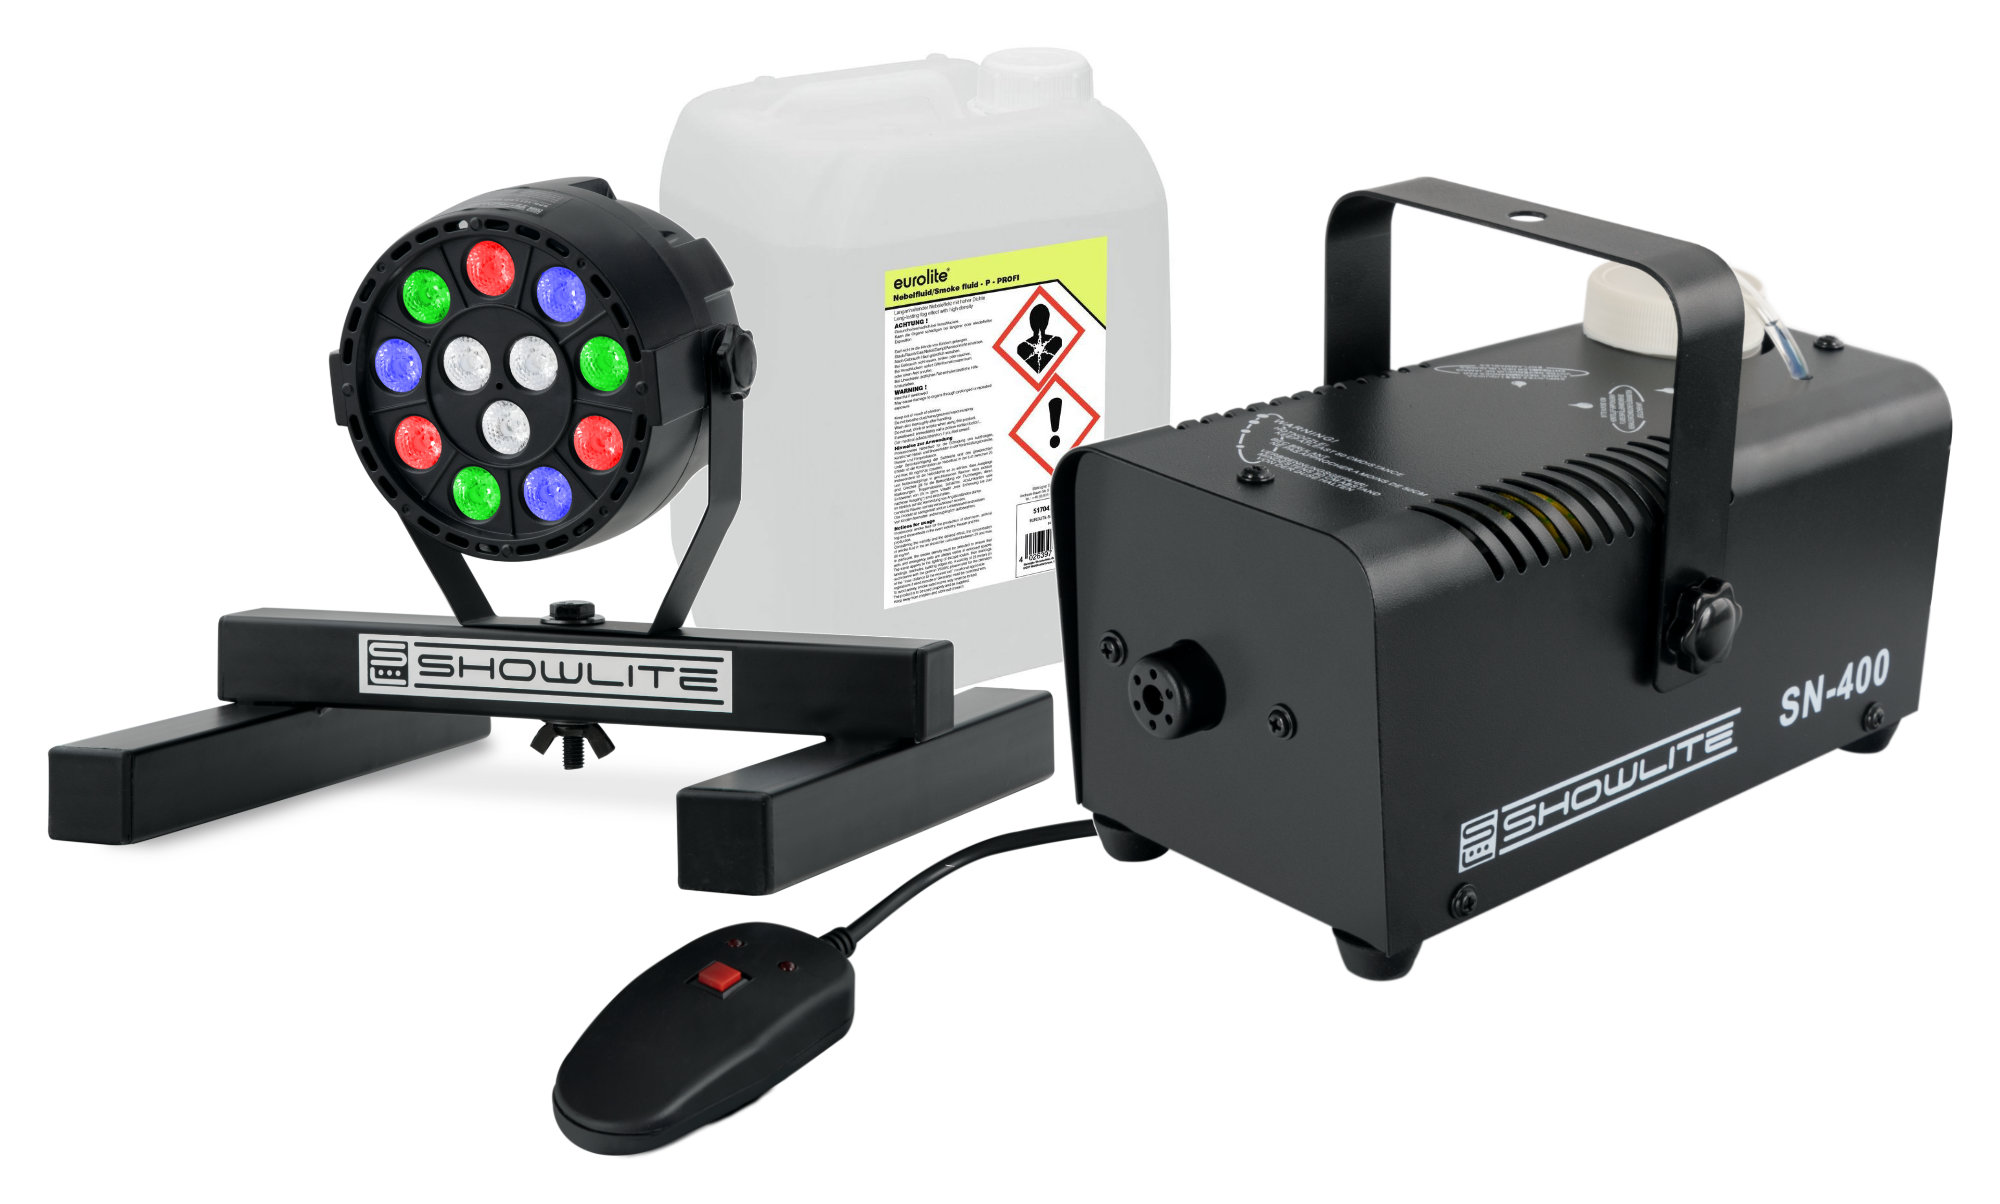 Nebeleffekte - Showlite SN 400 Nebelmaschine SPS 121 RGBW Spot 5 l Fluid Set - Onlineshop Musikhaus Kirstein